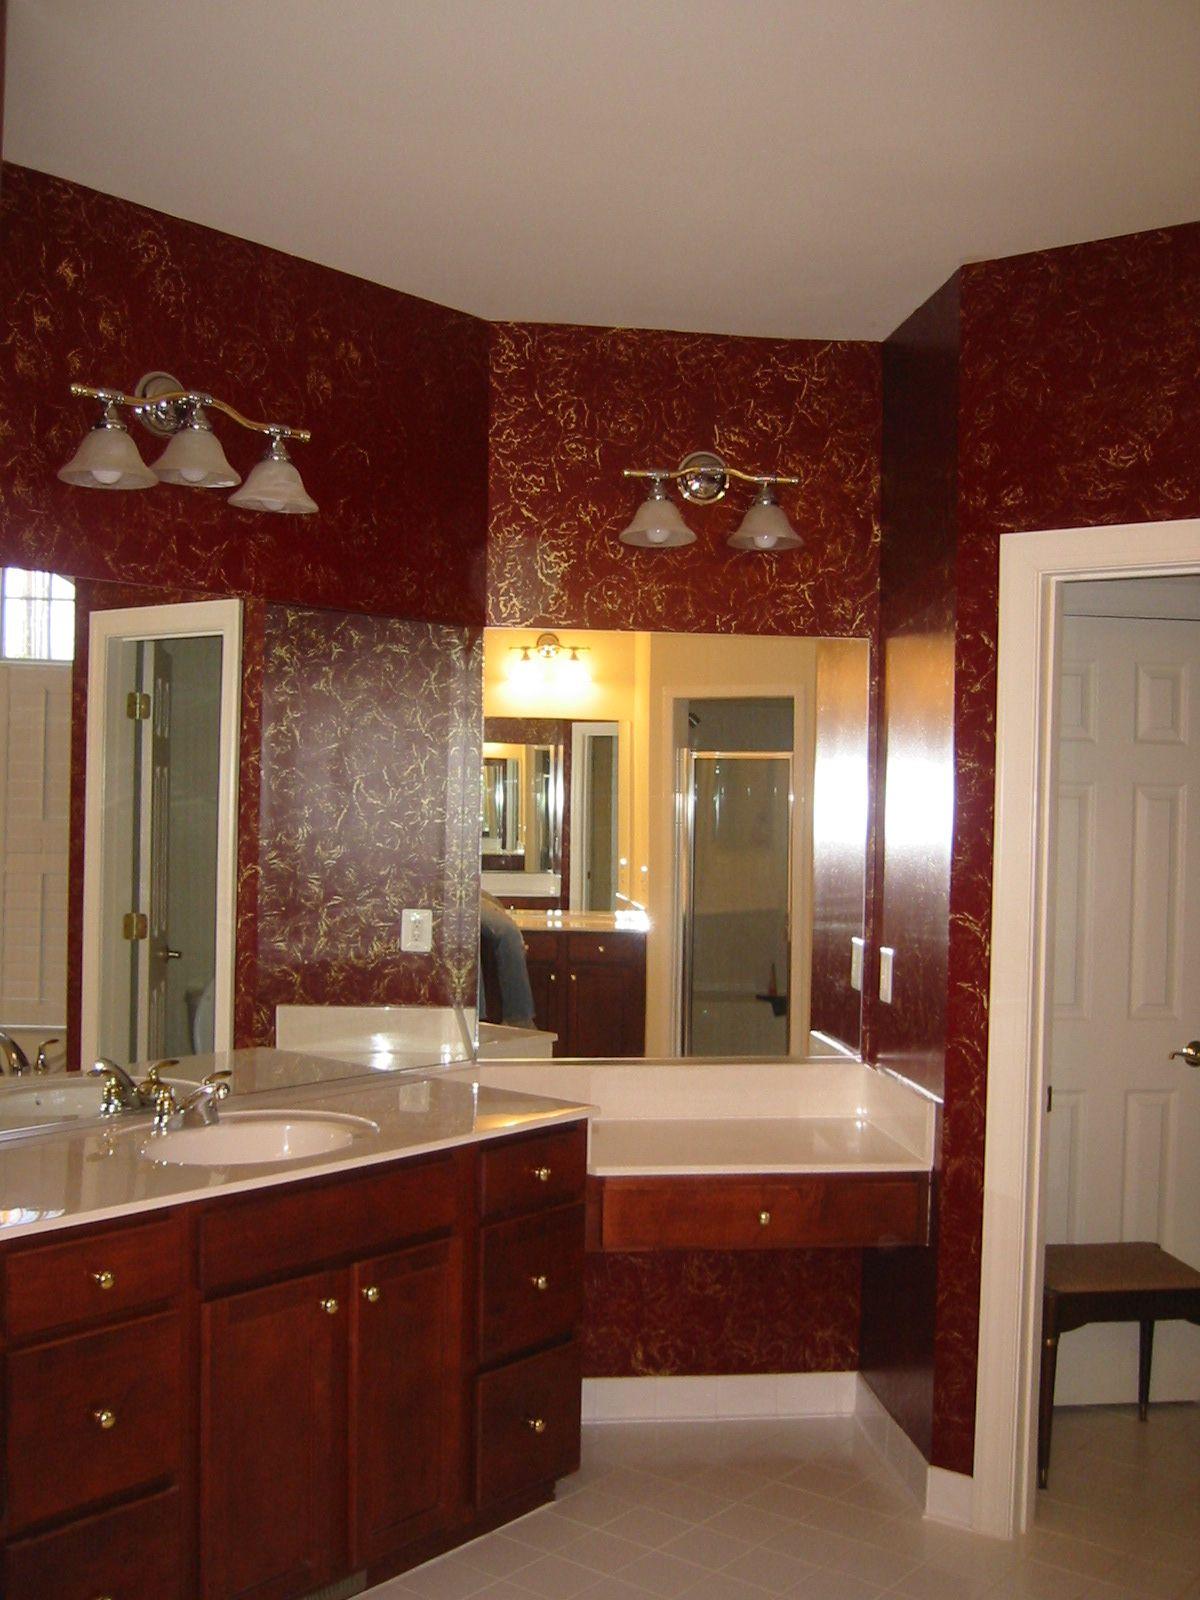 Fantastiskt burgundiskt badrum